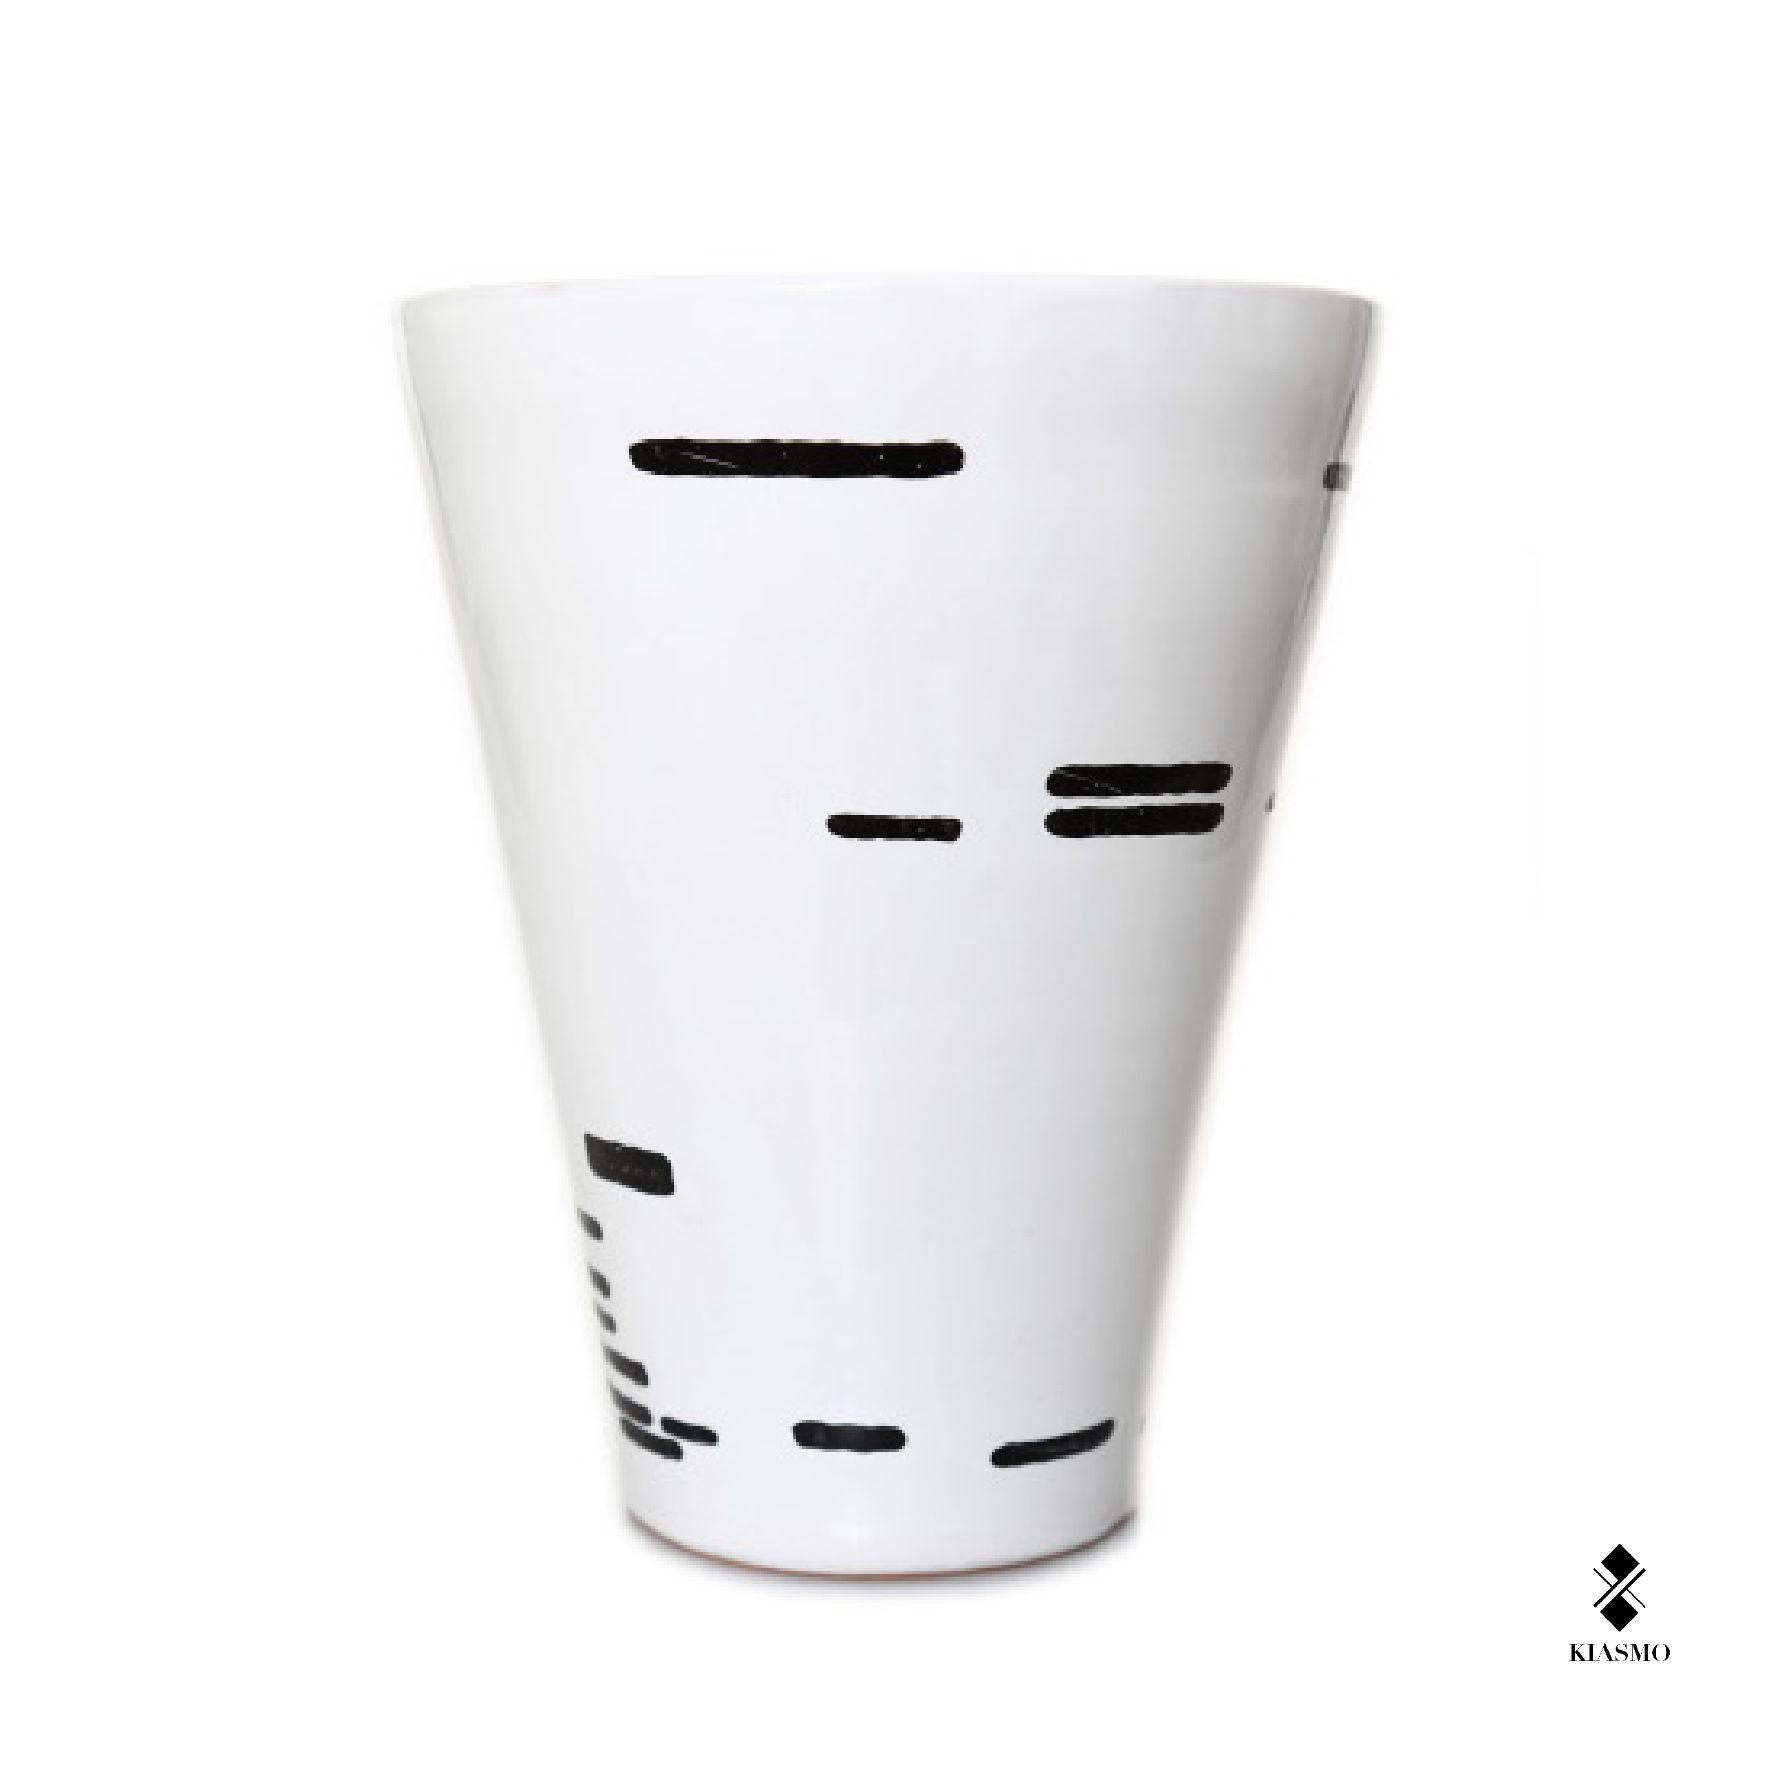 Vases   Series Horizontal   Horizontal II   2013   Designer Vincenzo D'Alba   Ceramic 20x26 cm   Handmade ceramic vase. Single work signed by the author. Kiasmo.   Made by Collection   Shop on line www.kiasmo.it #kiasmo #design #art #architecture #vincenzodalba #domus #domusweb #lovesdomus #archilovers #dekoration #vases #homedesign #ceramic #handmade #shops #artist #homedecor #style #italy #disegno #ispiration #elegant #original #artist #brand #luxury #artoftheday #vsco #collection